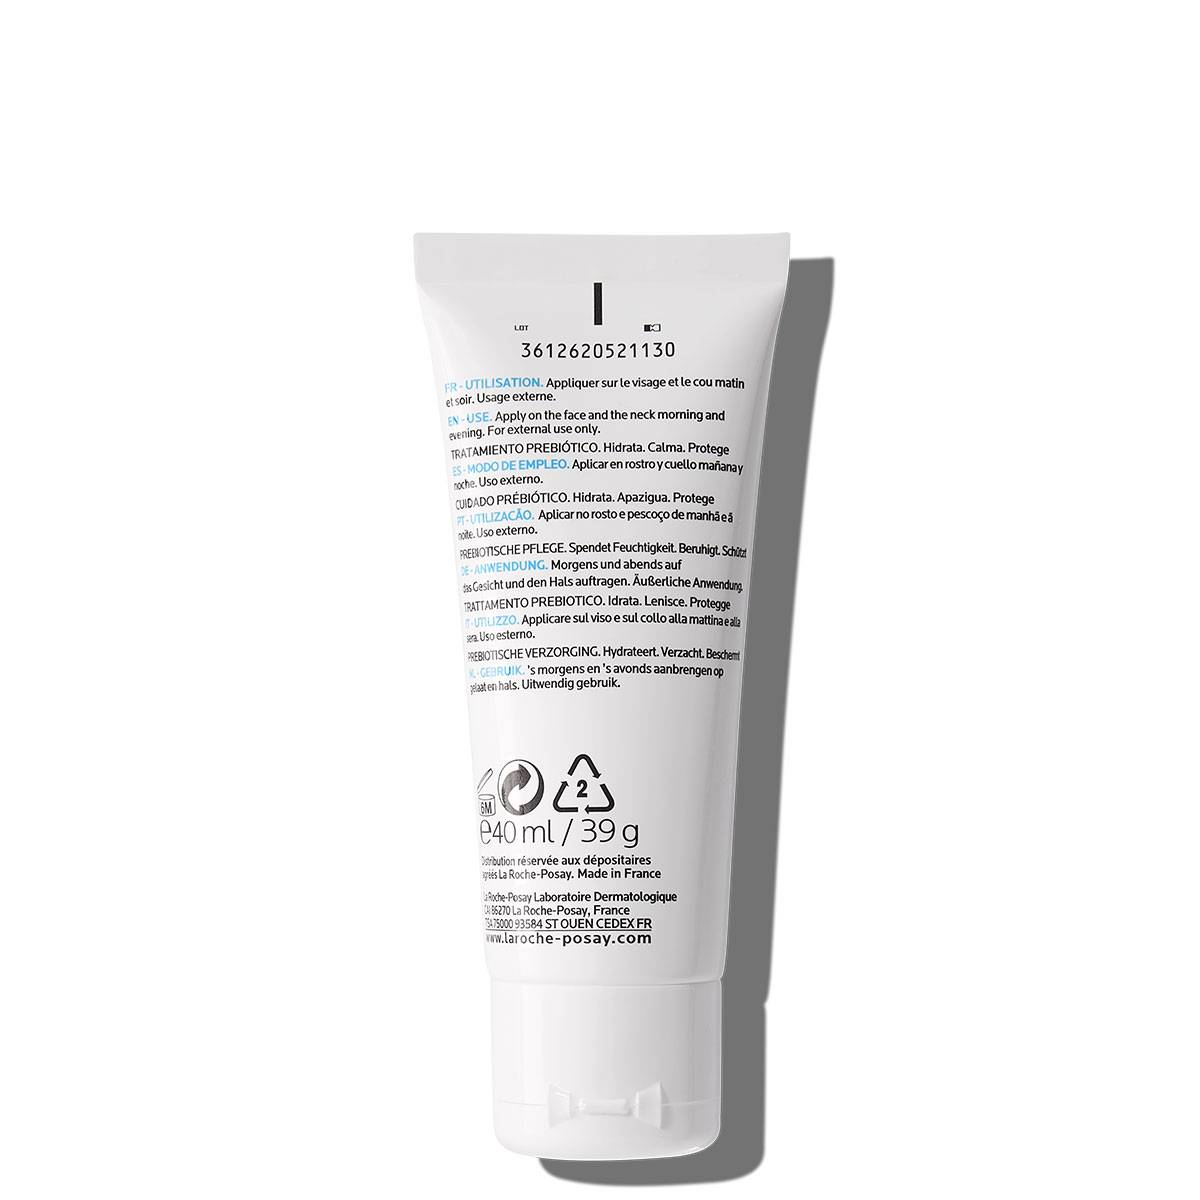 La Roche Posay ProduktSide Sensitiv Tendens til allergi Toleriane Sensitiv Preb